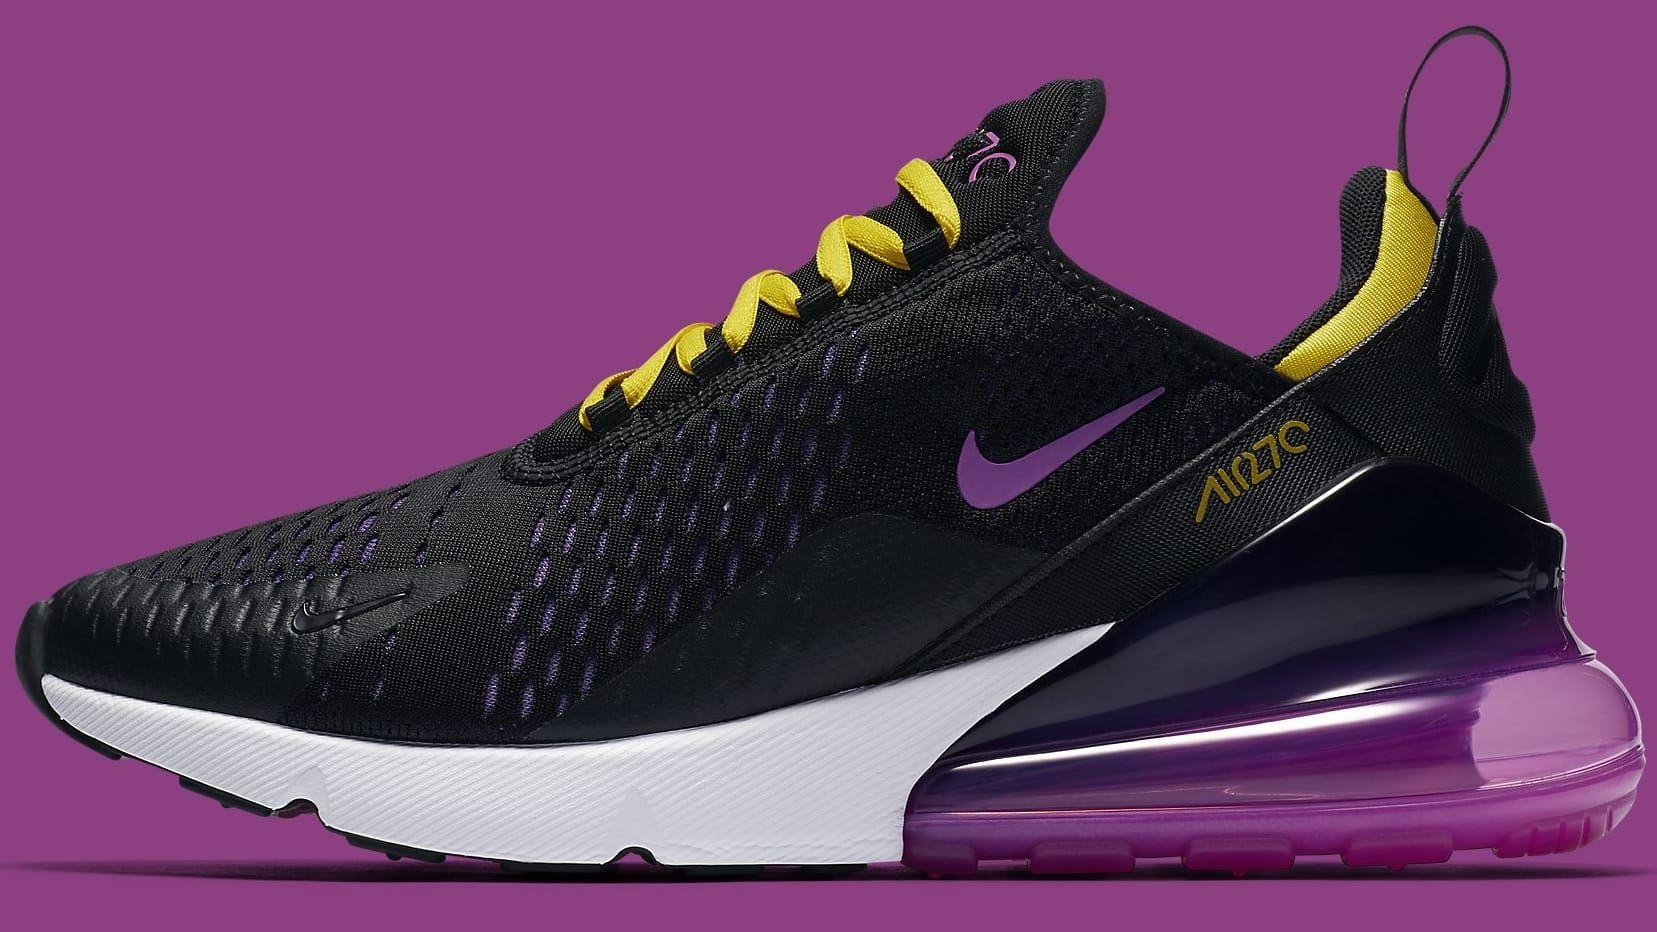 2a298cd5379c5 Nike Air Max 270